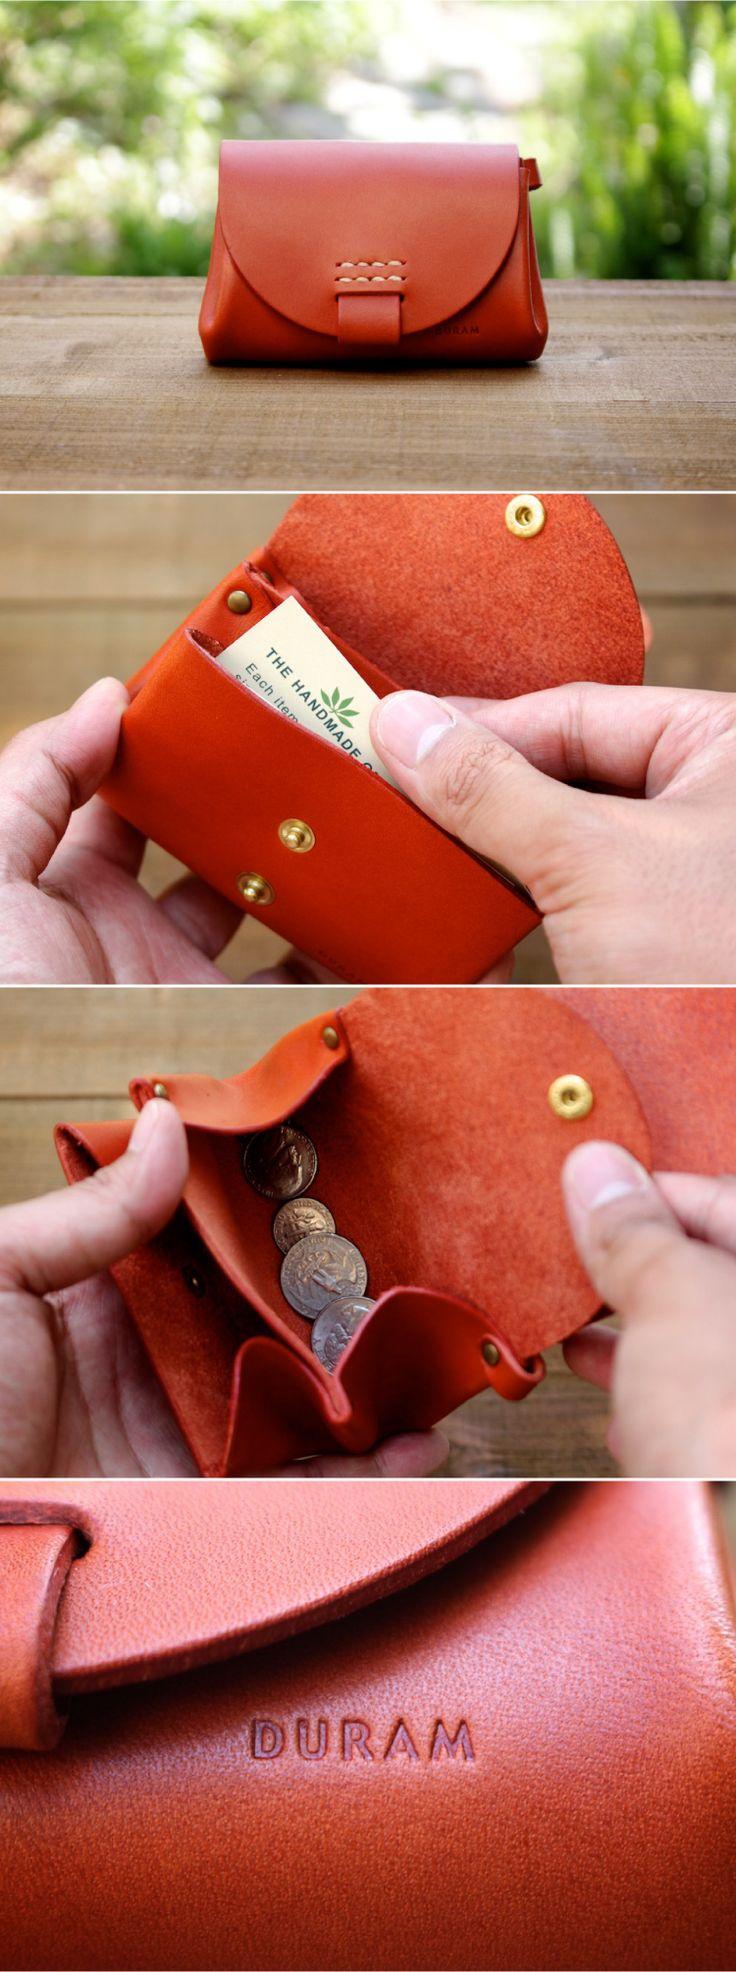 leather wallet | Duram Factory                                                                                                                                                                                 もっと見る                                                                                                                                                                                 もっと見る